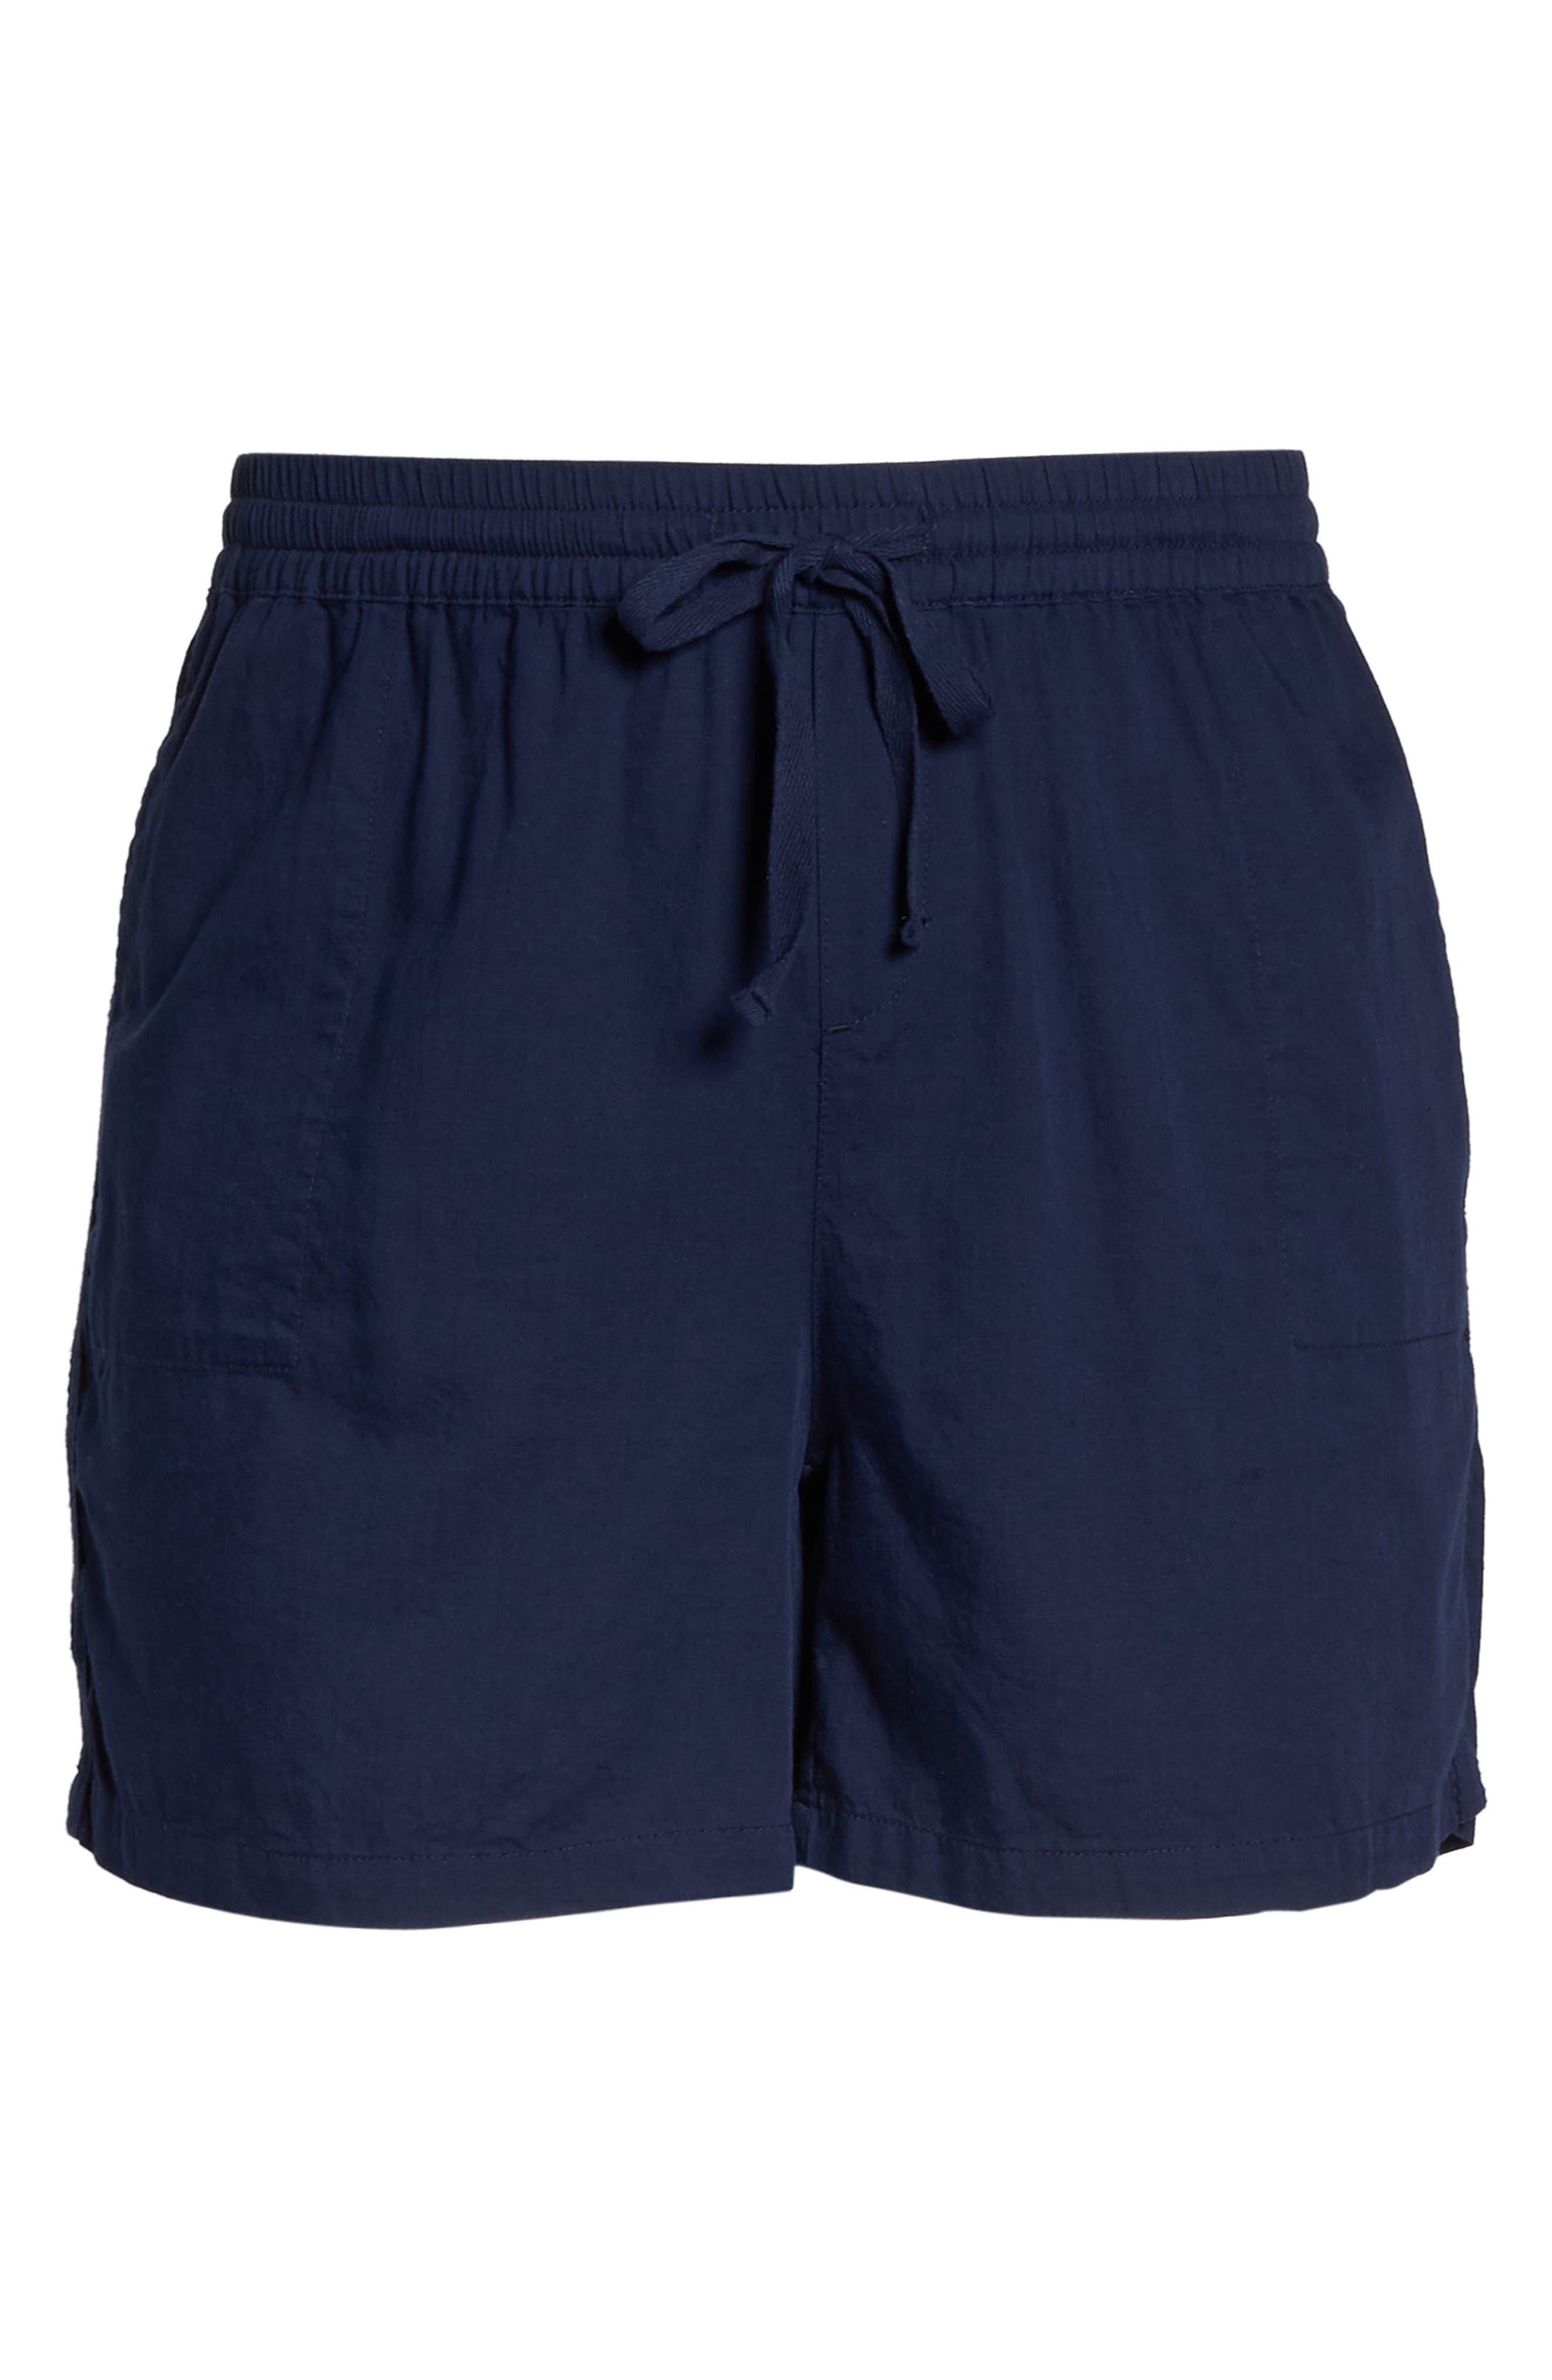 Pull-On Twill Shorts,                             Alternate thumbnail 7, color,                             NAVY PEACOAT